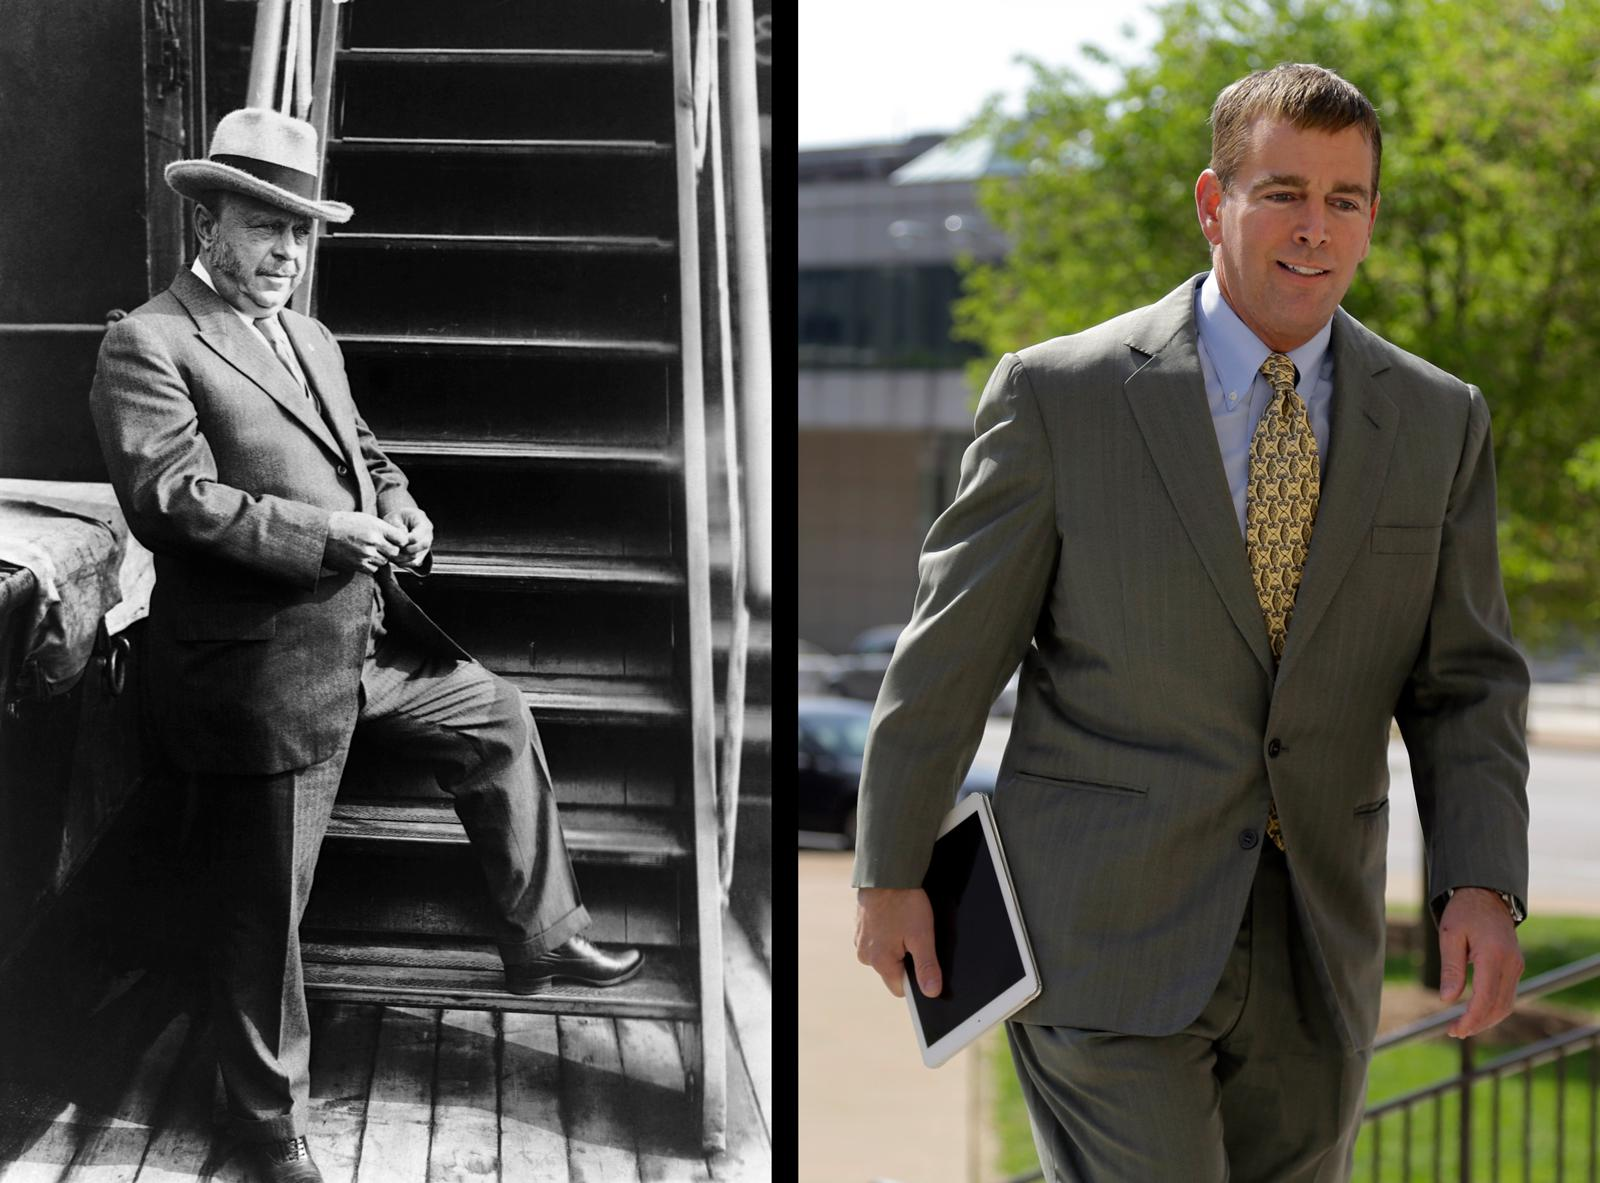 August Busch Sr. (left) and August Busch IV